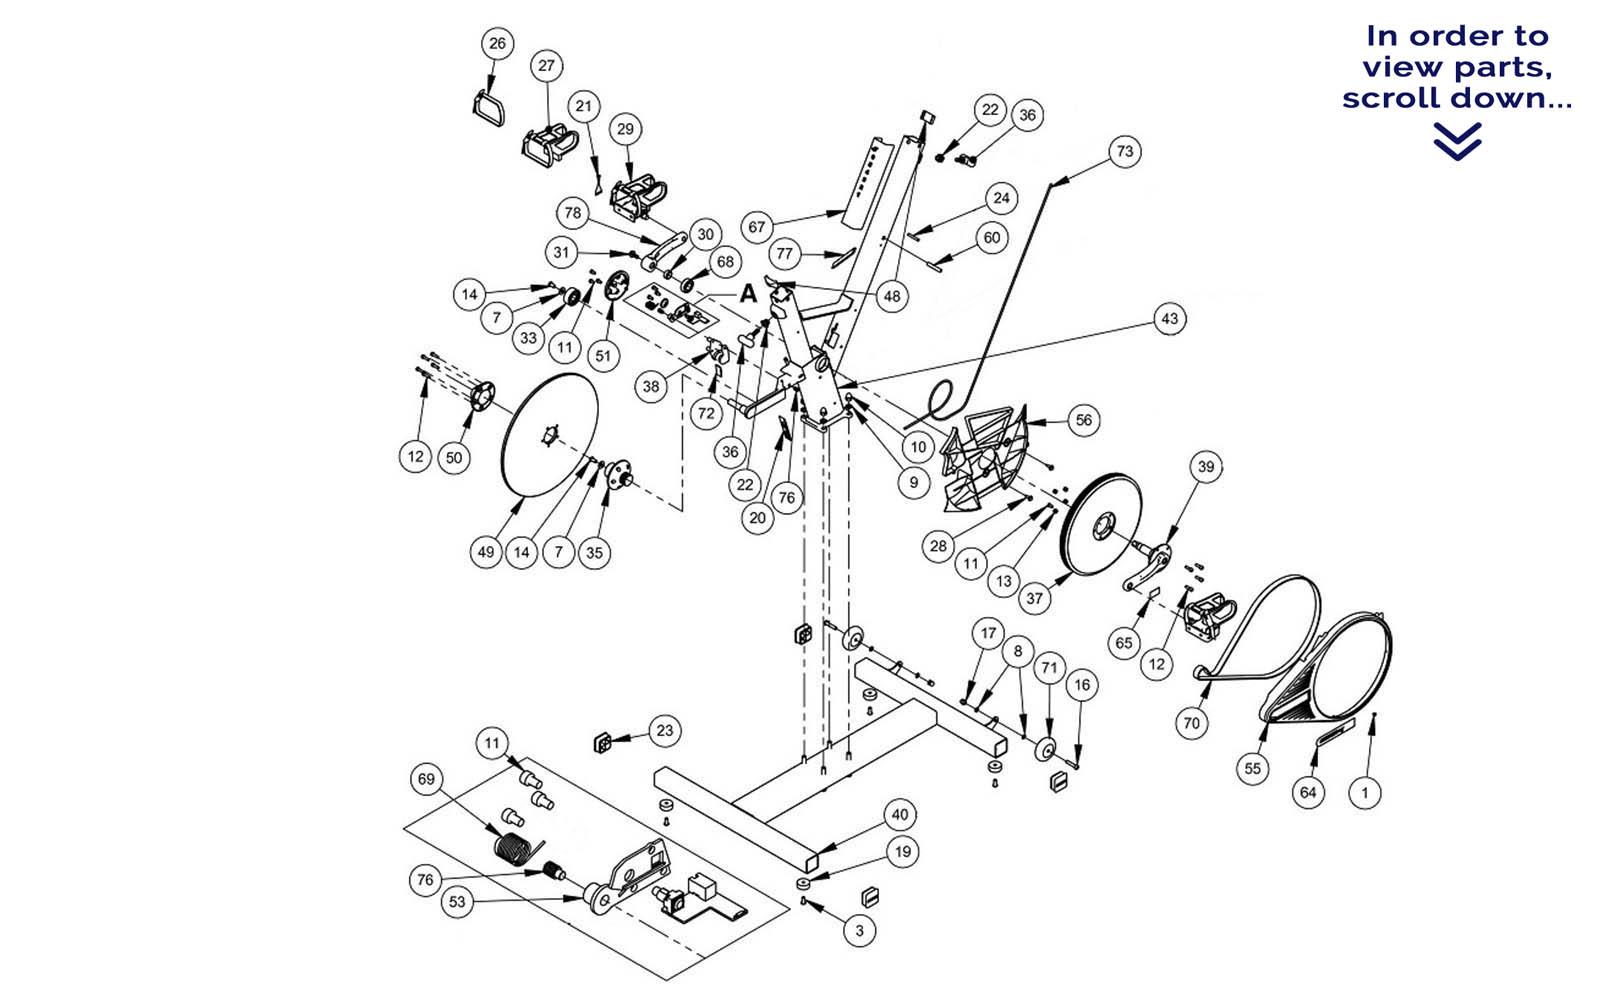 diagram of bicycle parts